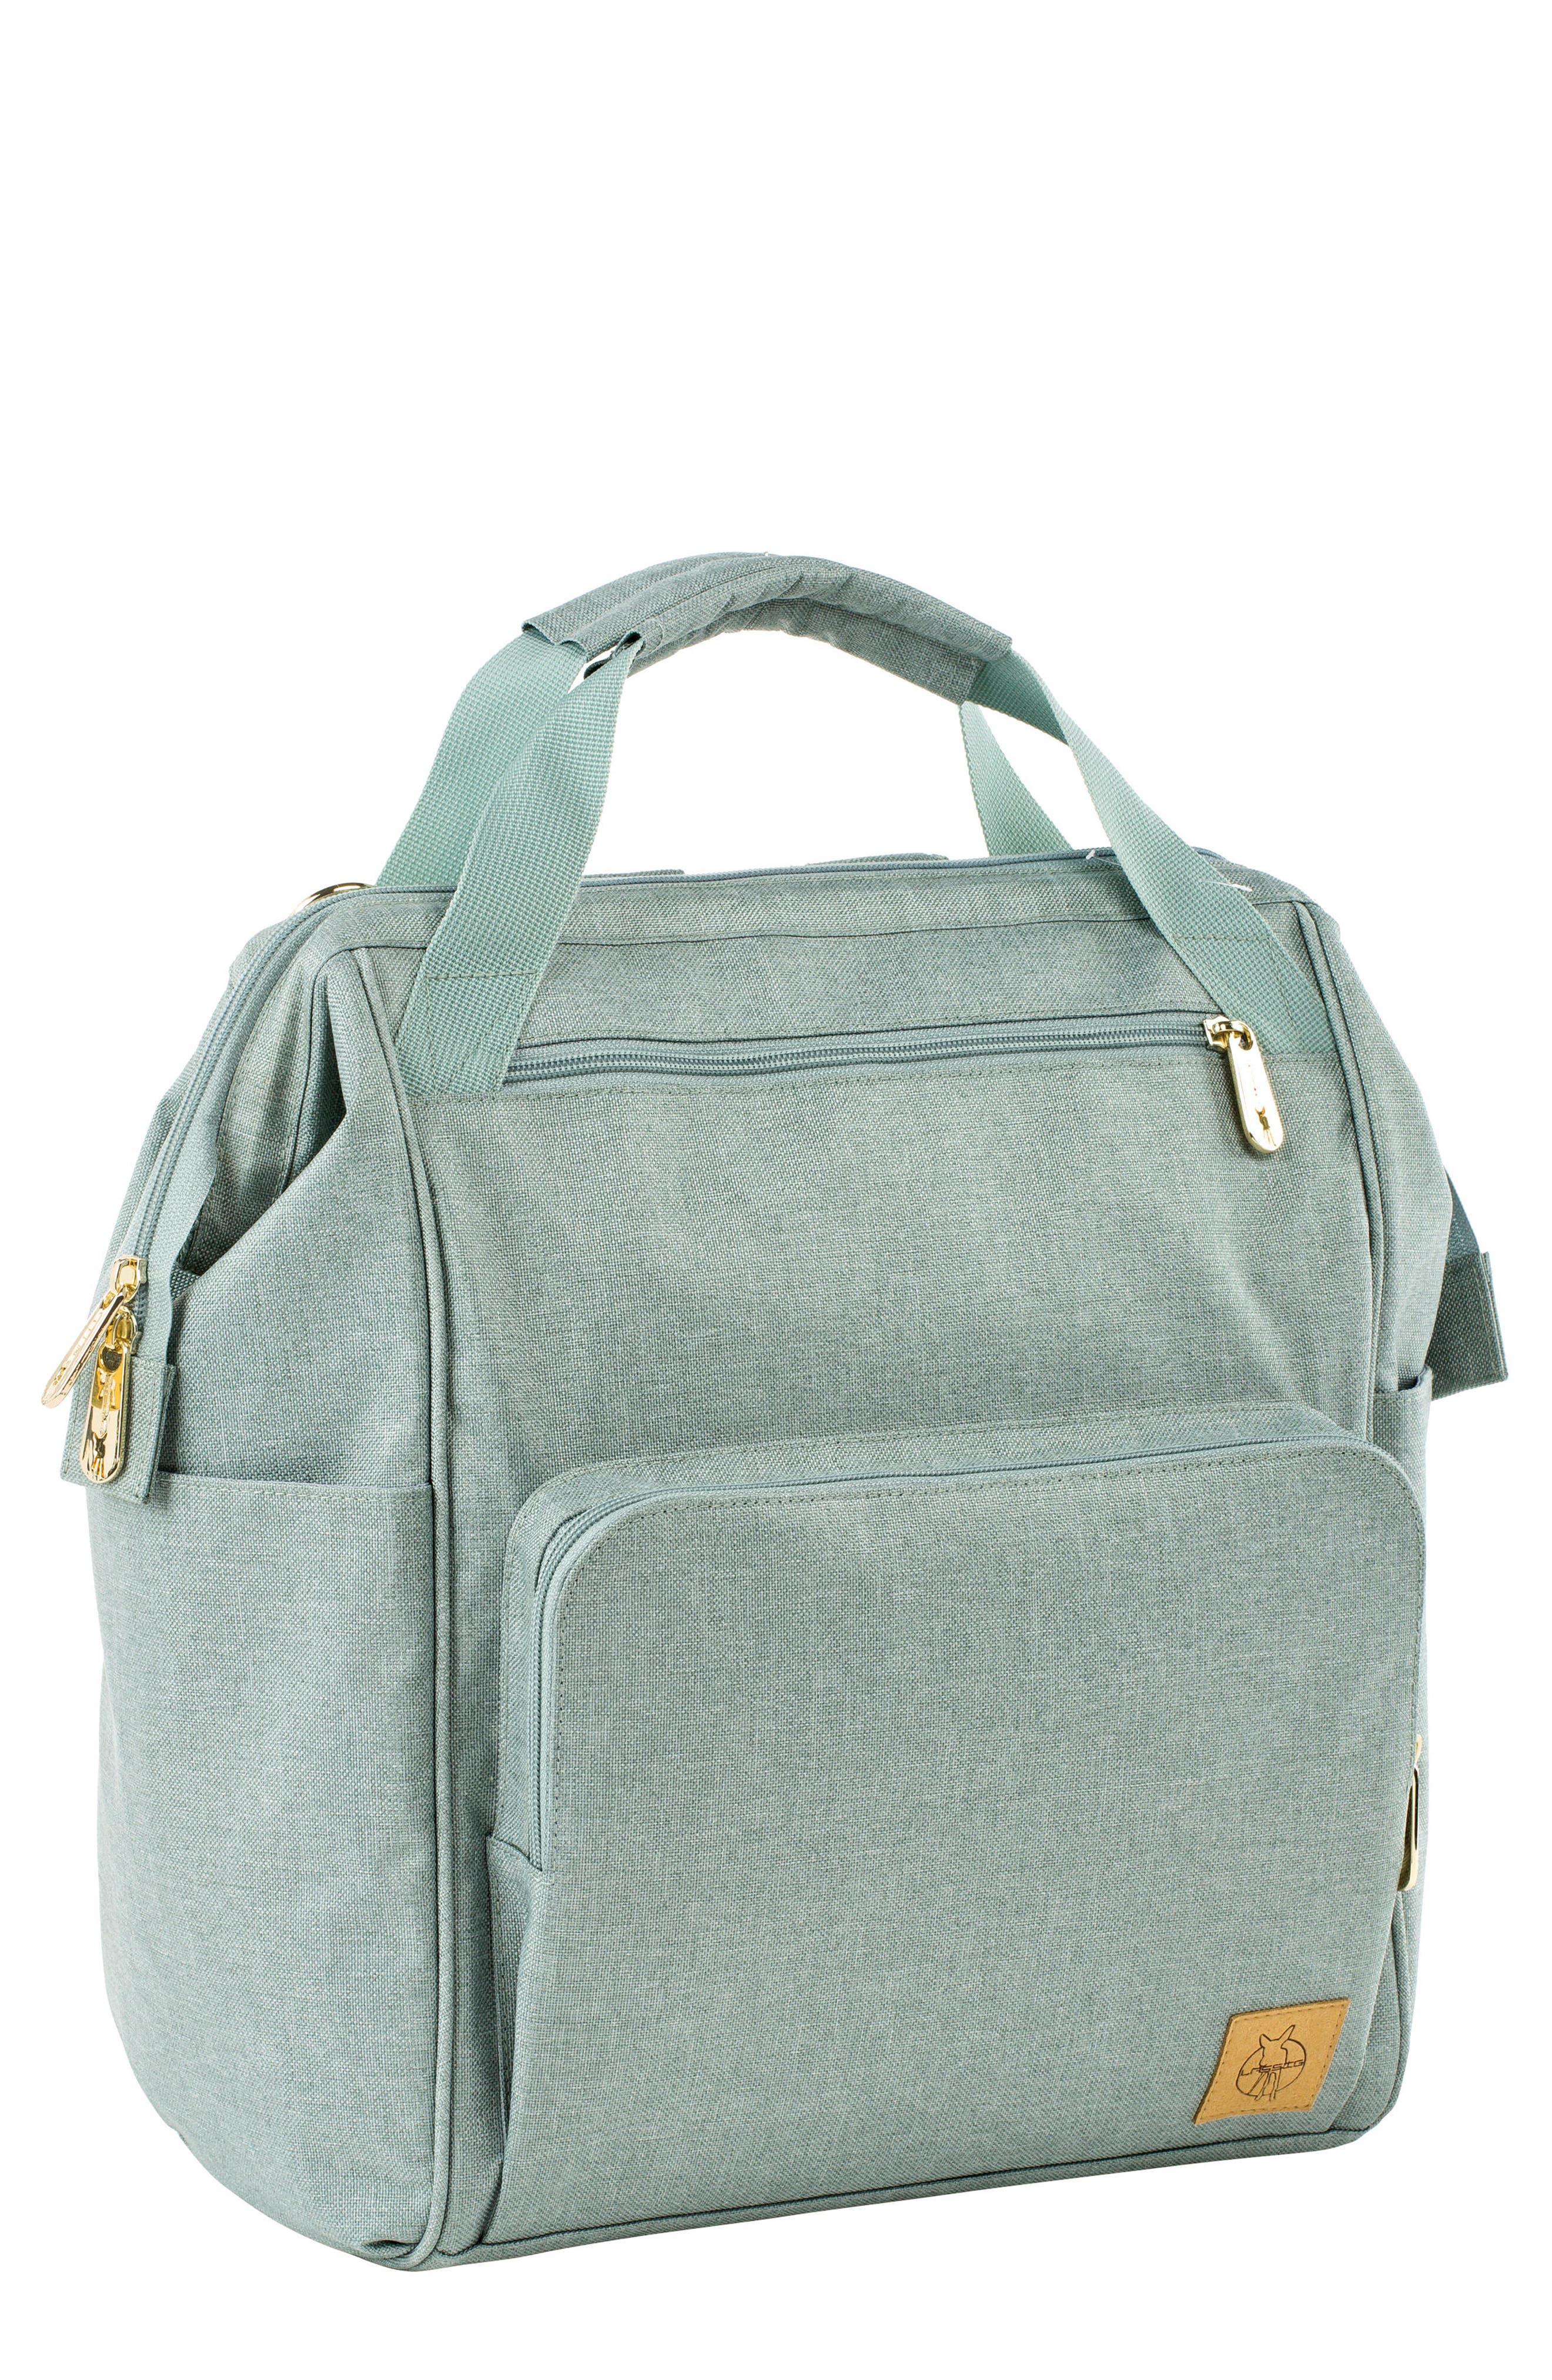 Lässig Glam Goldie Diaper Backpack